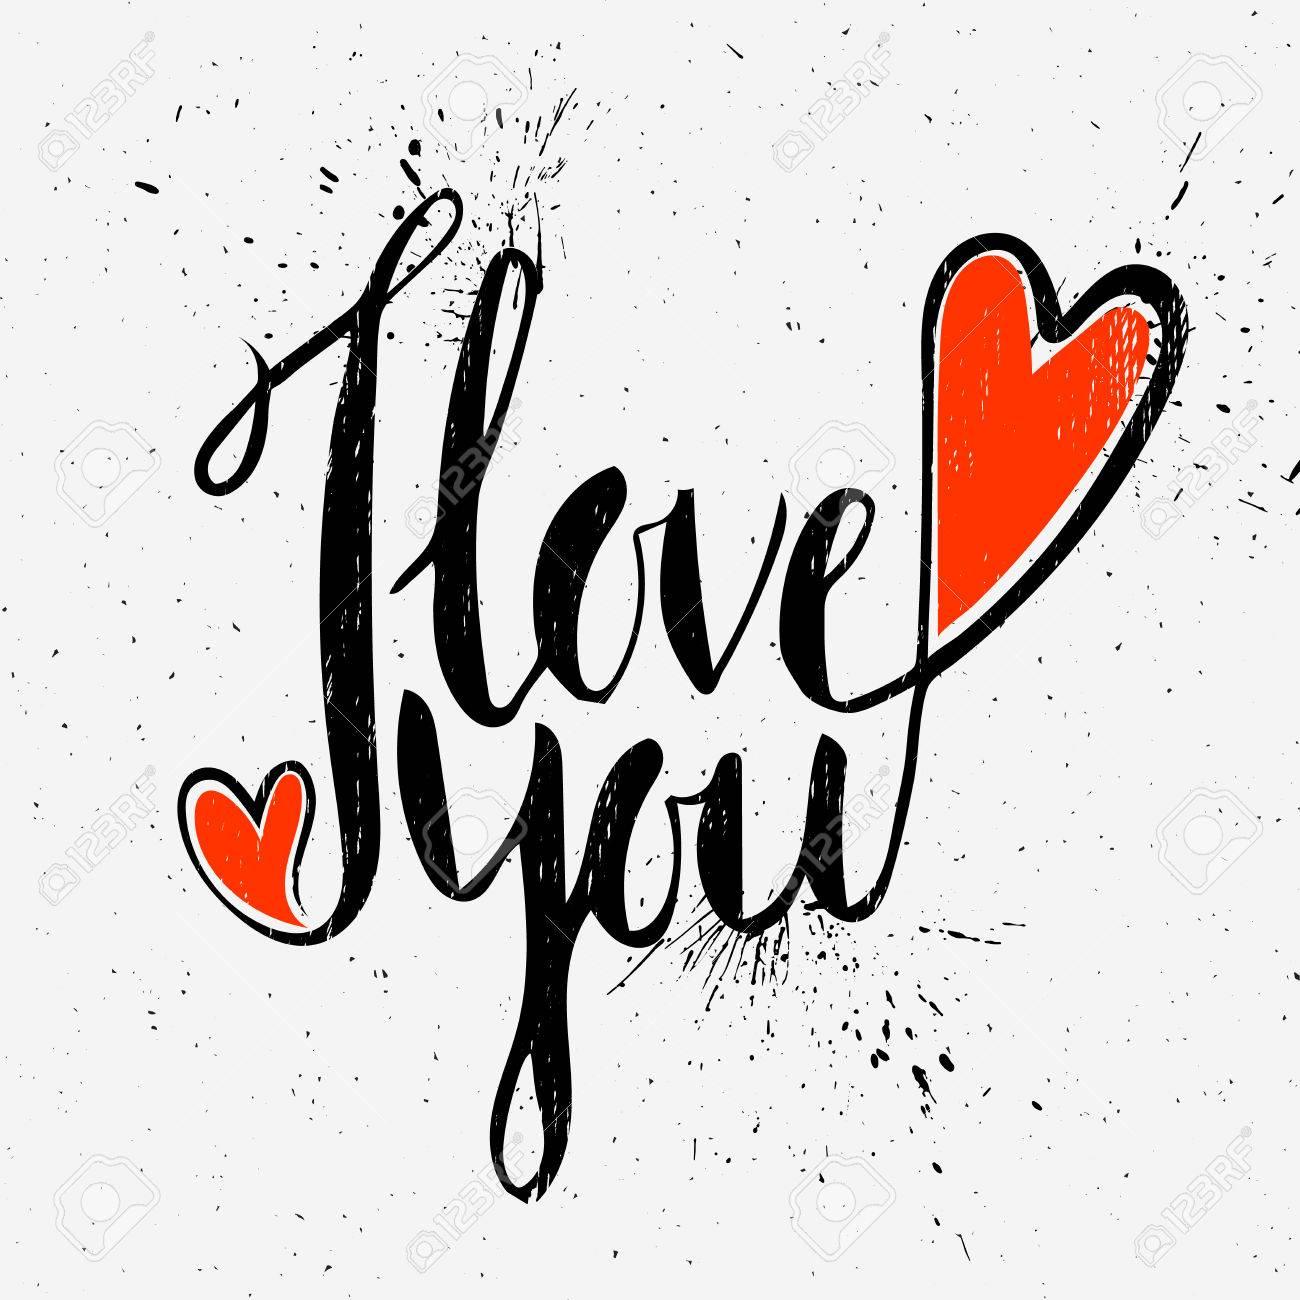 Grunge textured handwritten calligraphic inscription I love you on light background. Lettering design element for greeting card, banner, invitation, postcard, vignette, flyer. Vector illustration. - 51157837